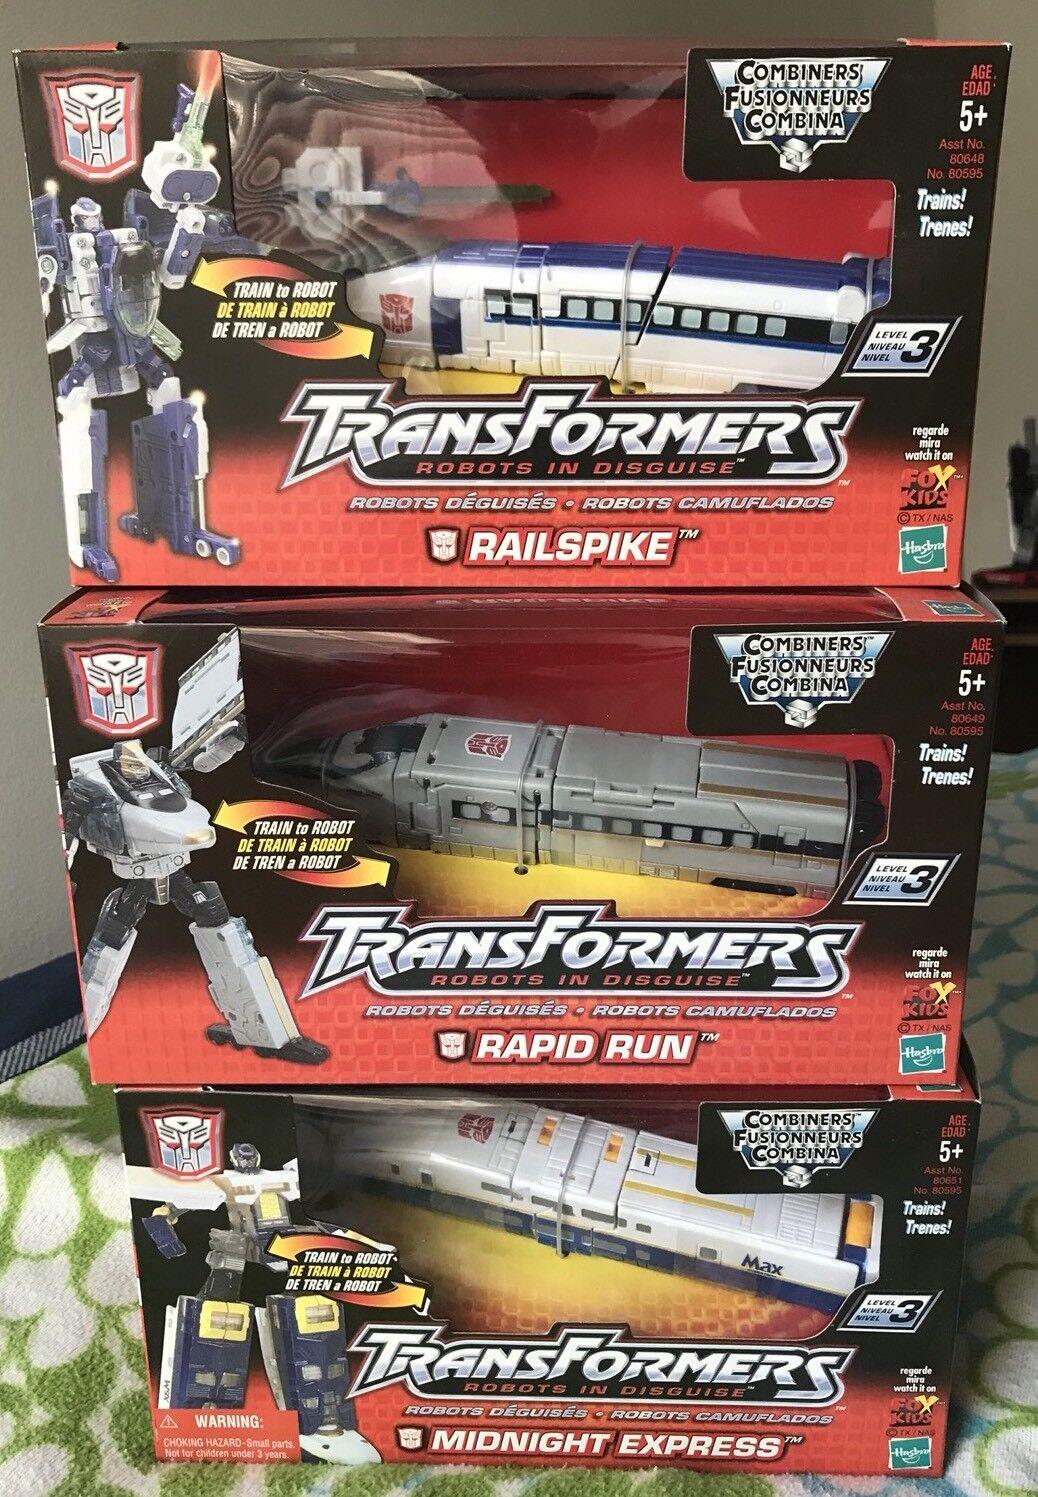 Transformers Rid trenes todos 3 sin usar y en caja sellada 2001 Rail Racer-Midnight Express, Railspike